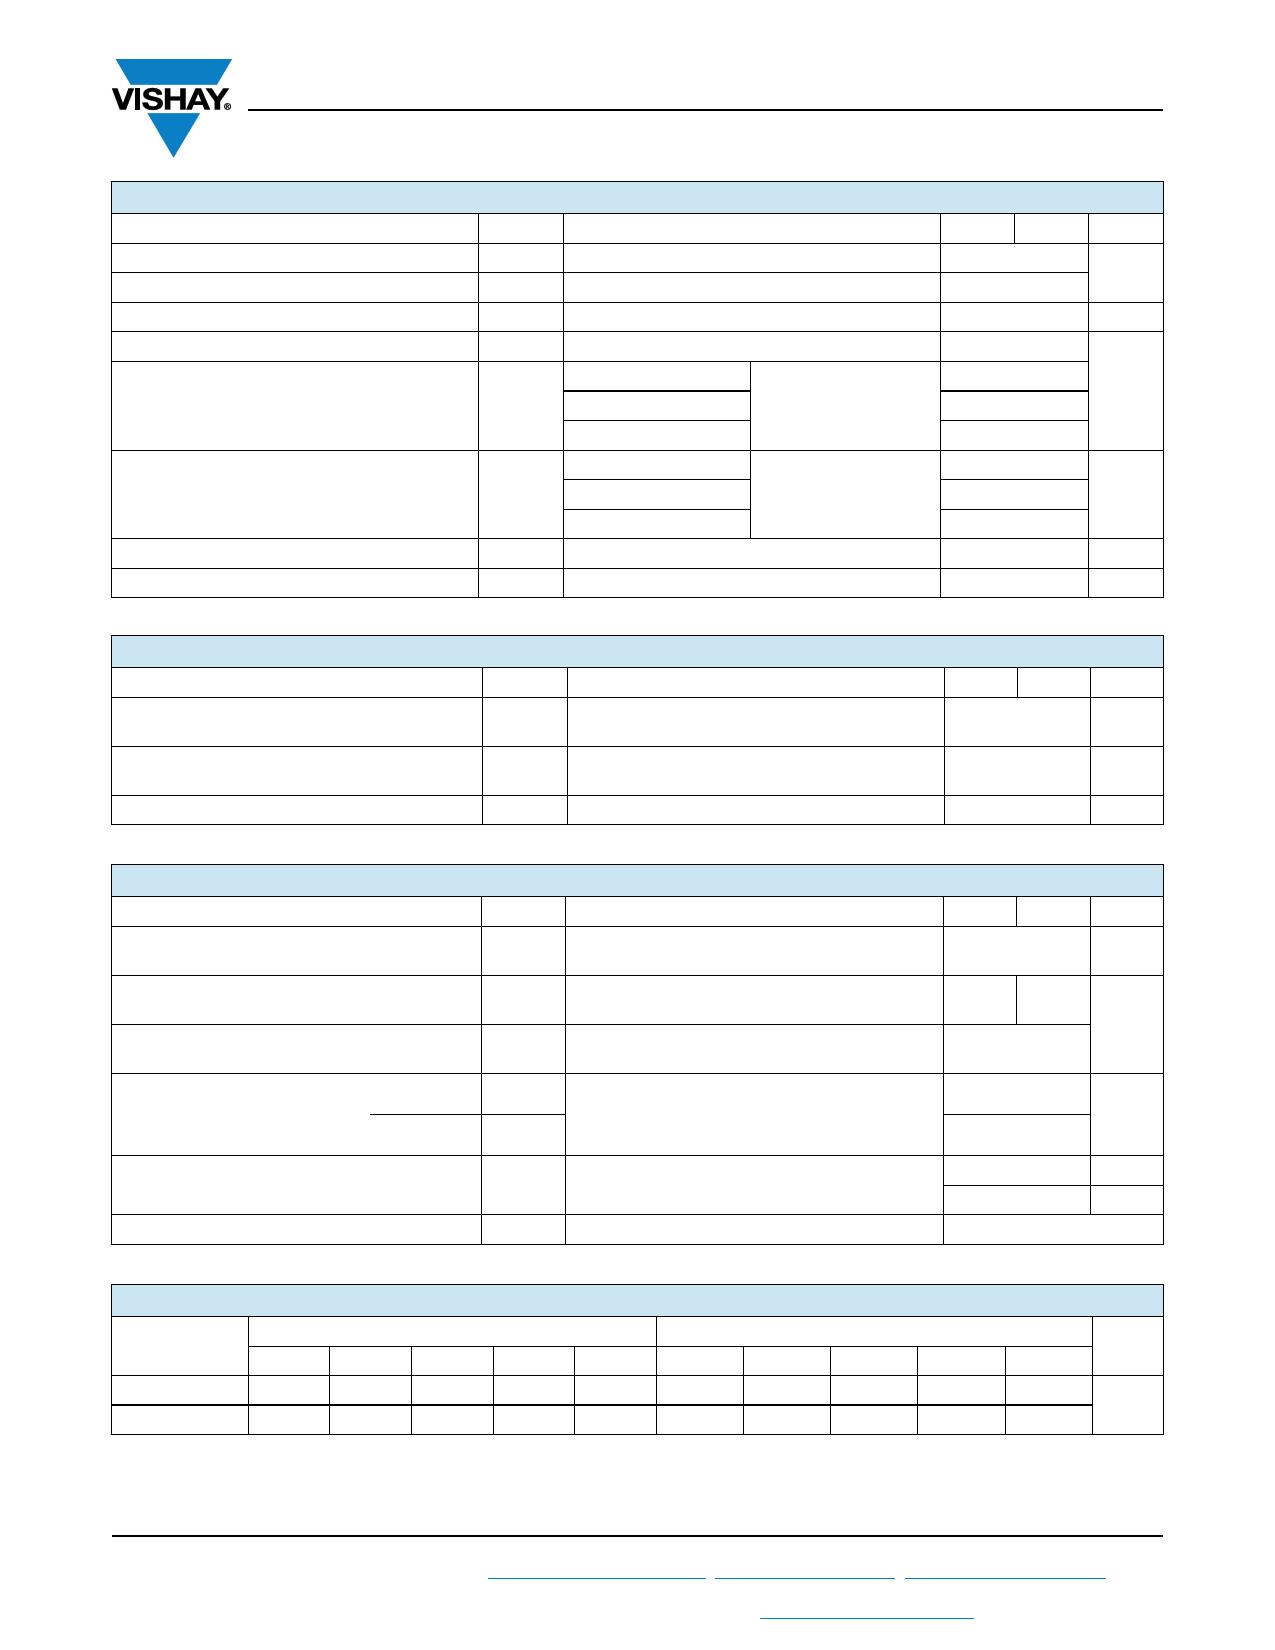 VSKT42-08P pdf, ピン配列